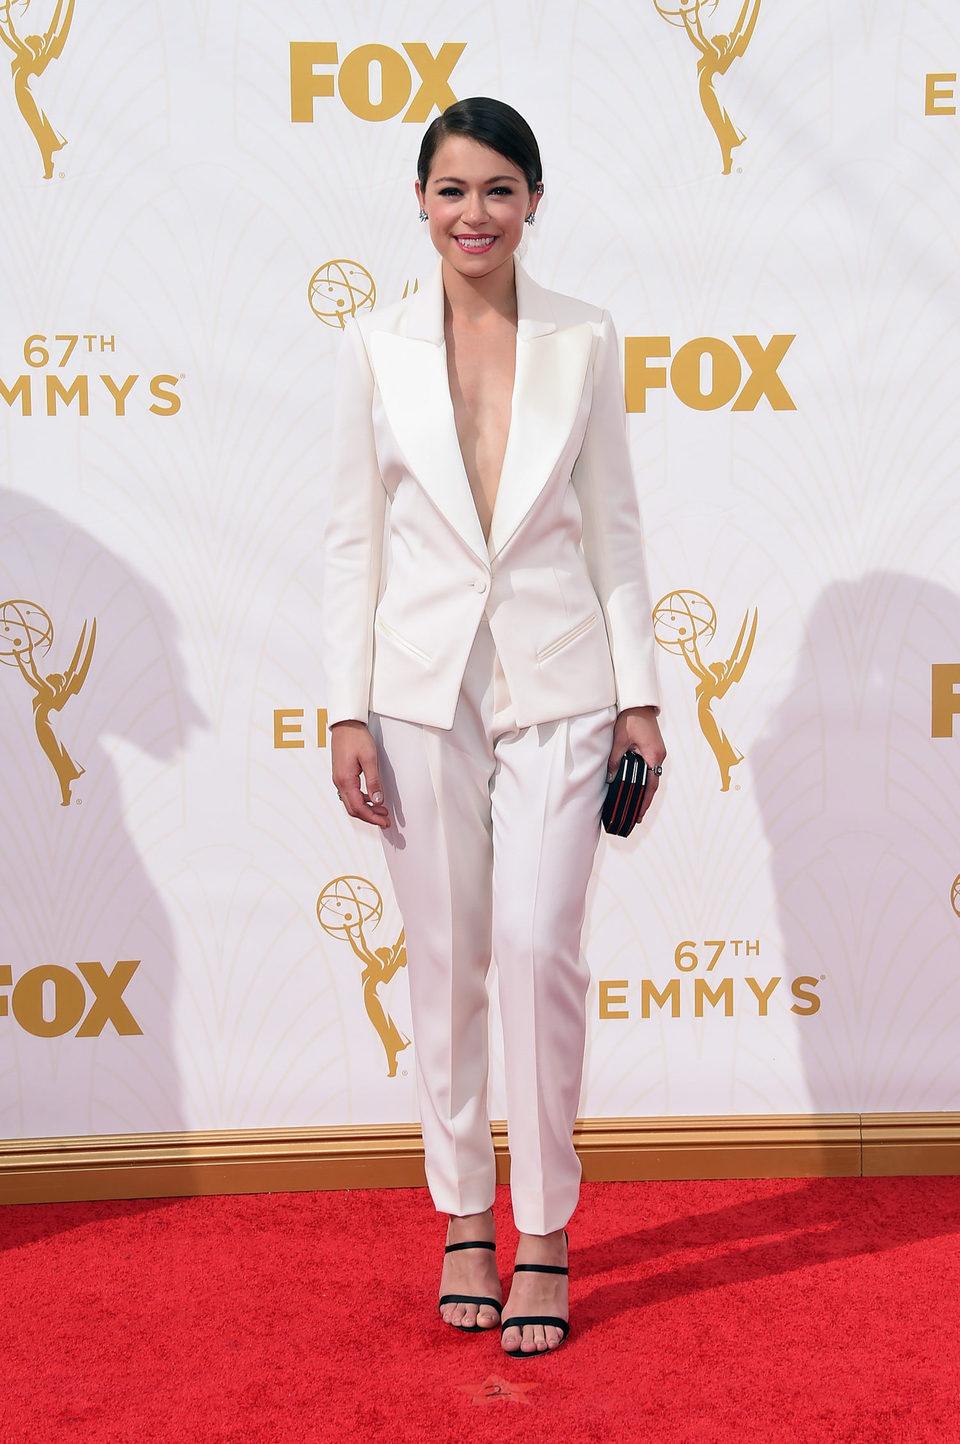 Tatiana Maslany en la alfombra roja de los Emmy 2015